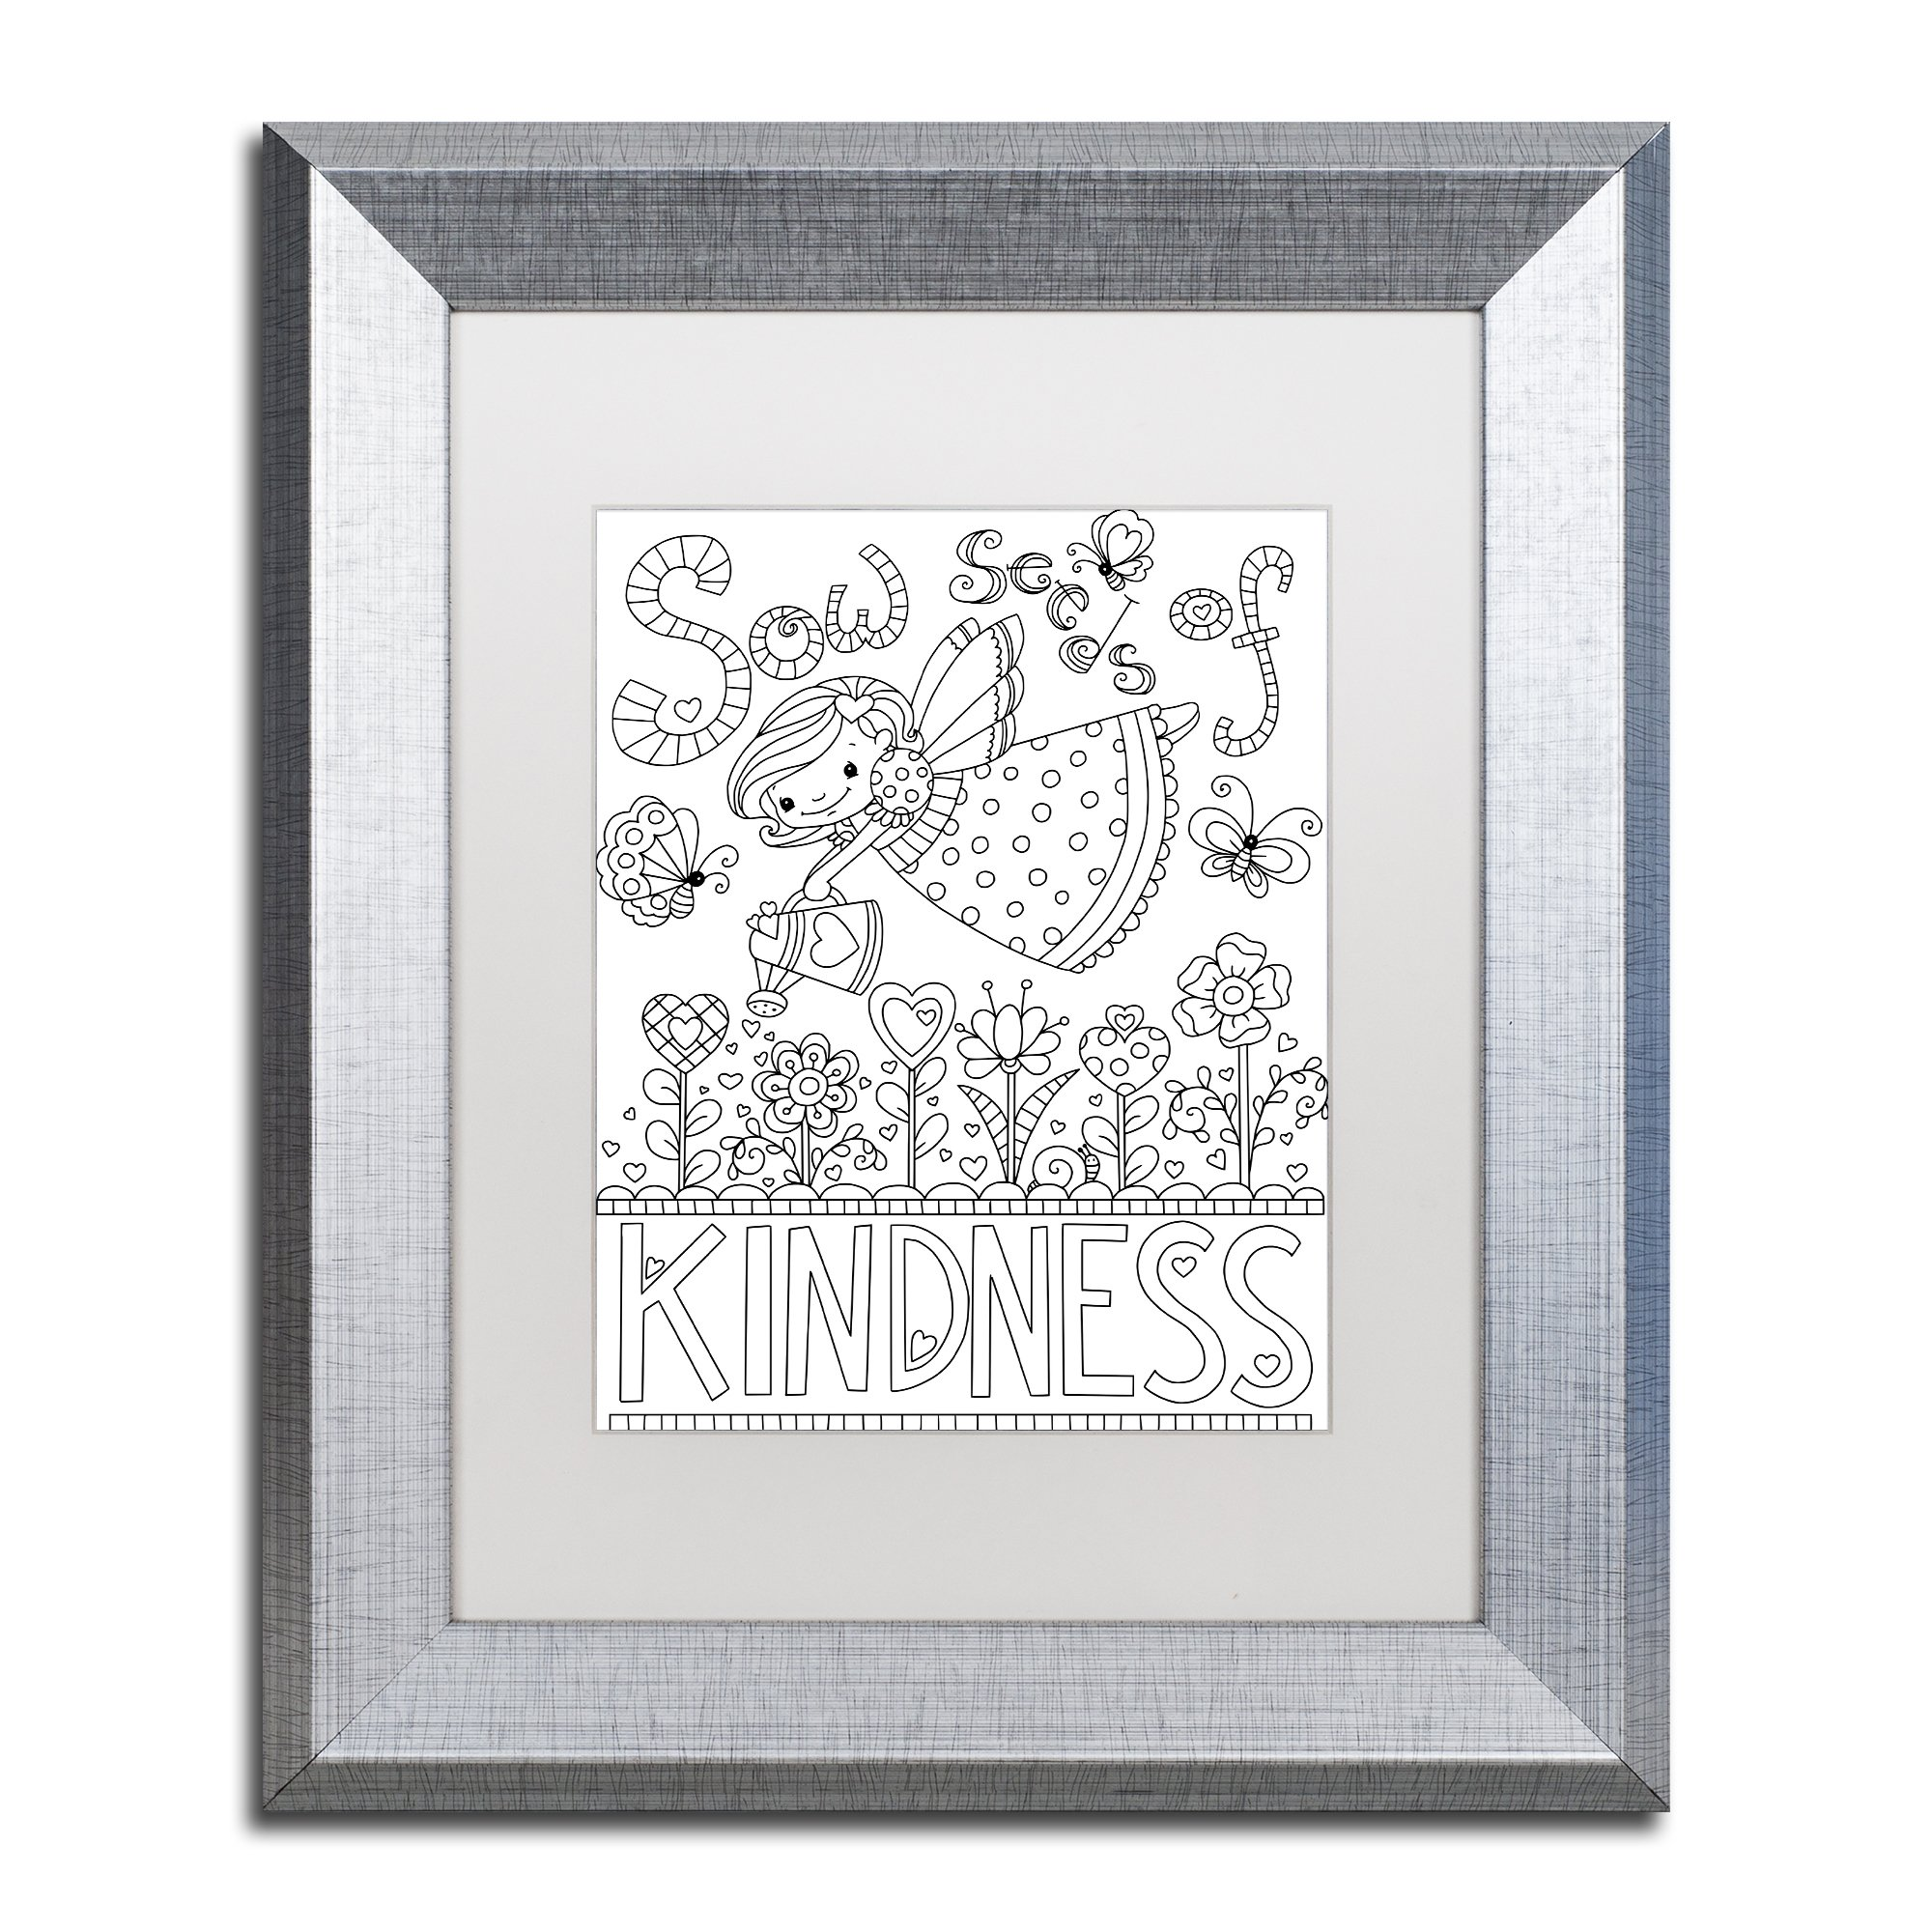 Sow Seeds by Jennifer Nilsson, White Matte, Silver Frame 11x14-Inch by Trademark Fine Art